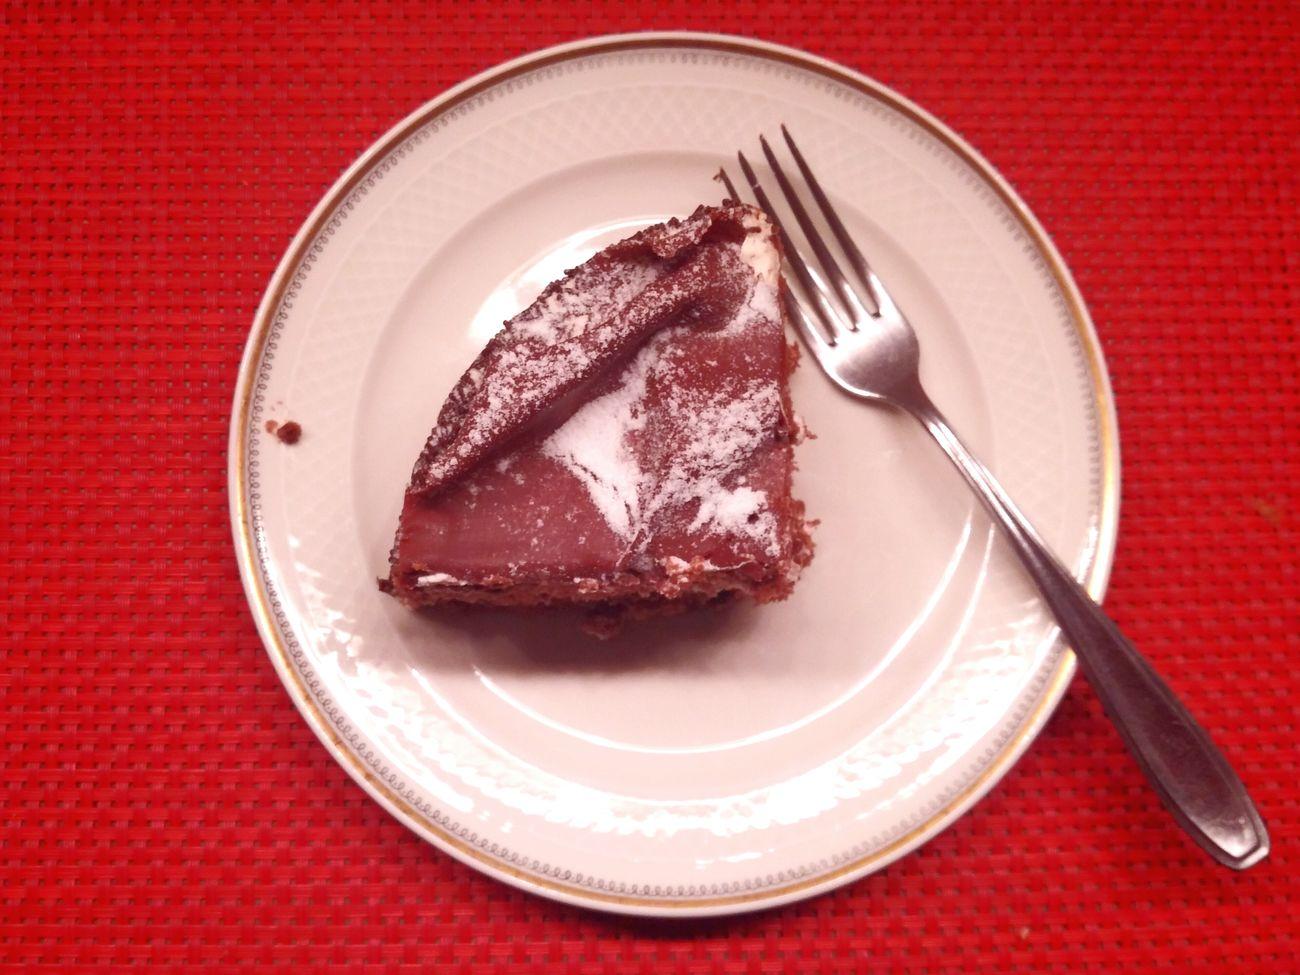 Gnam! Cake Food Foodporn Blackforestcake Sweet Chocolate Dinner Swiss